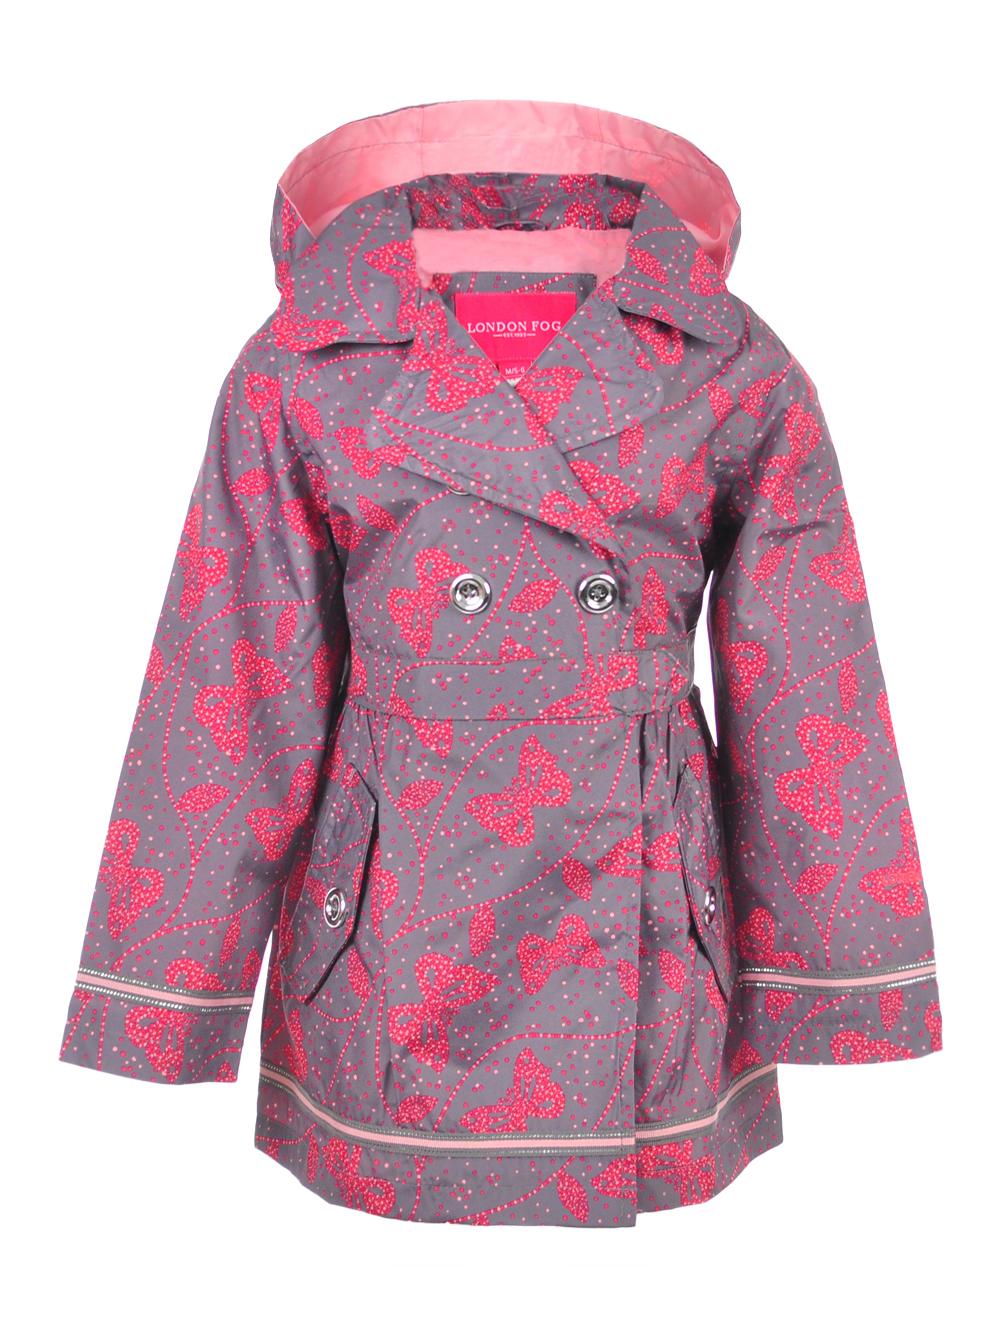 94a87f758 London Fog Girls  Hooded Raincoat